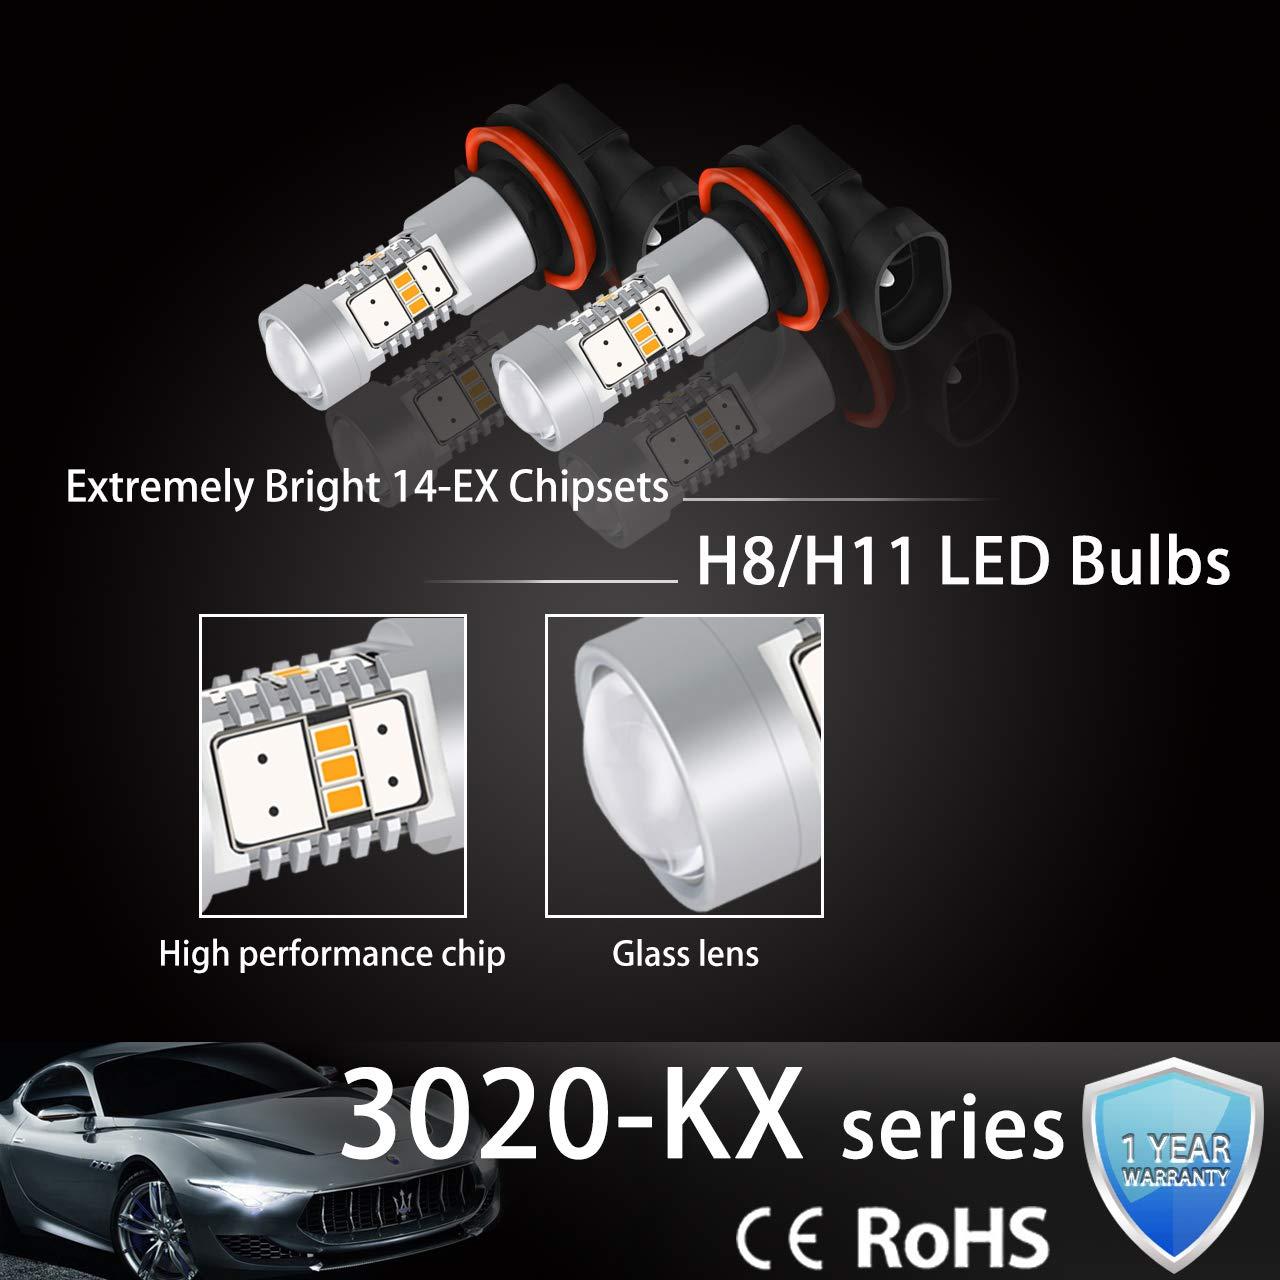 NGCAT 1800 Lumens 14 SMD 3020 CREE 9006 HB4 LED Bulbs for Fog Lights DRL Turn Signals Light Bulbs Back Up Reverse Lights,DC 10-16V Halogen Yellow 2-Pack